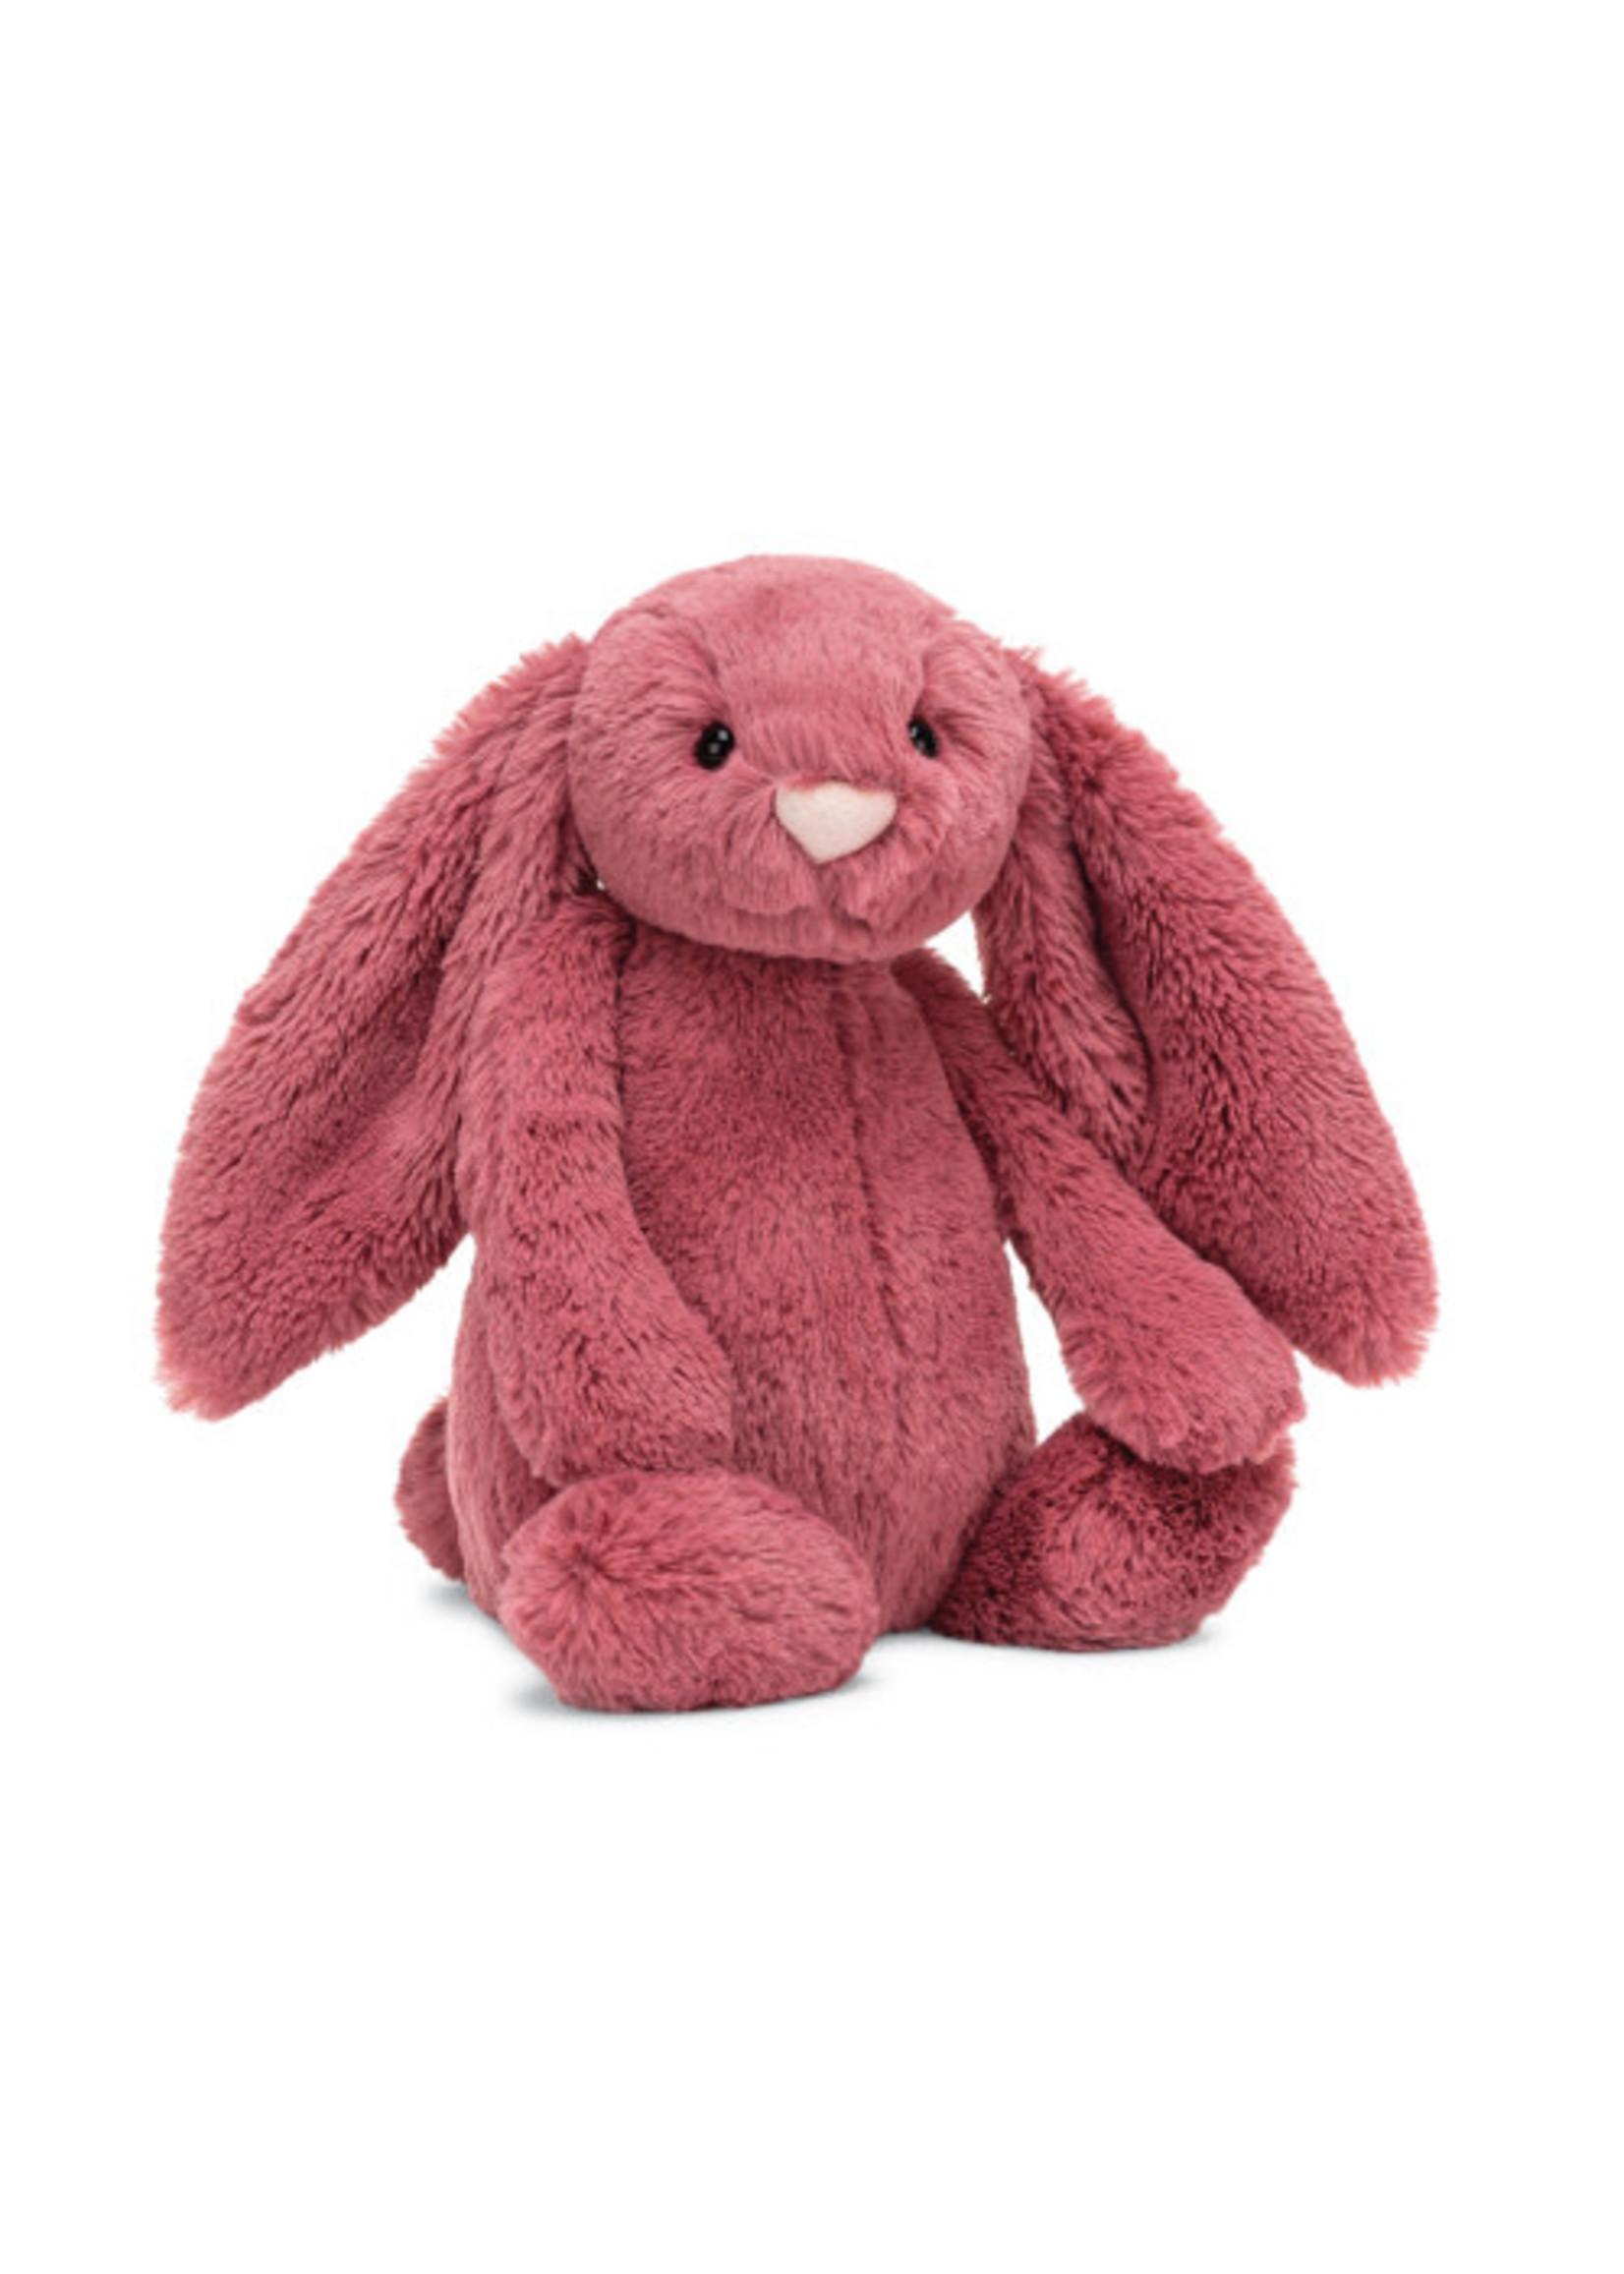 Jellycat JC Medium Bashful Dusty Pink Bunny